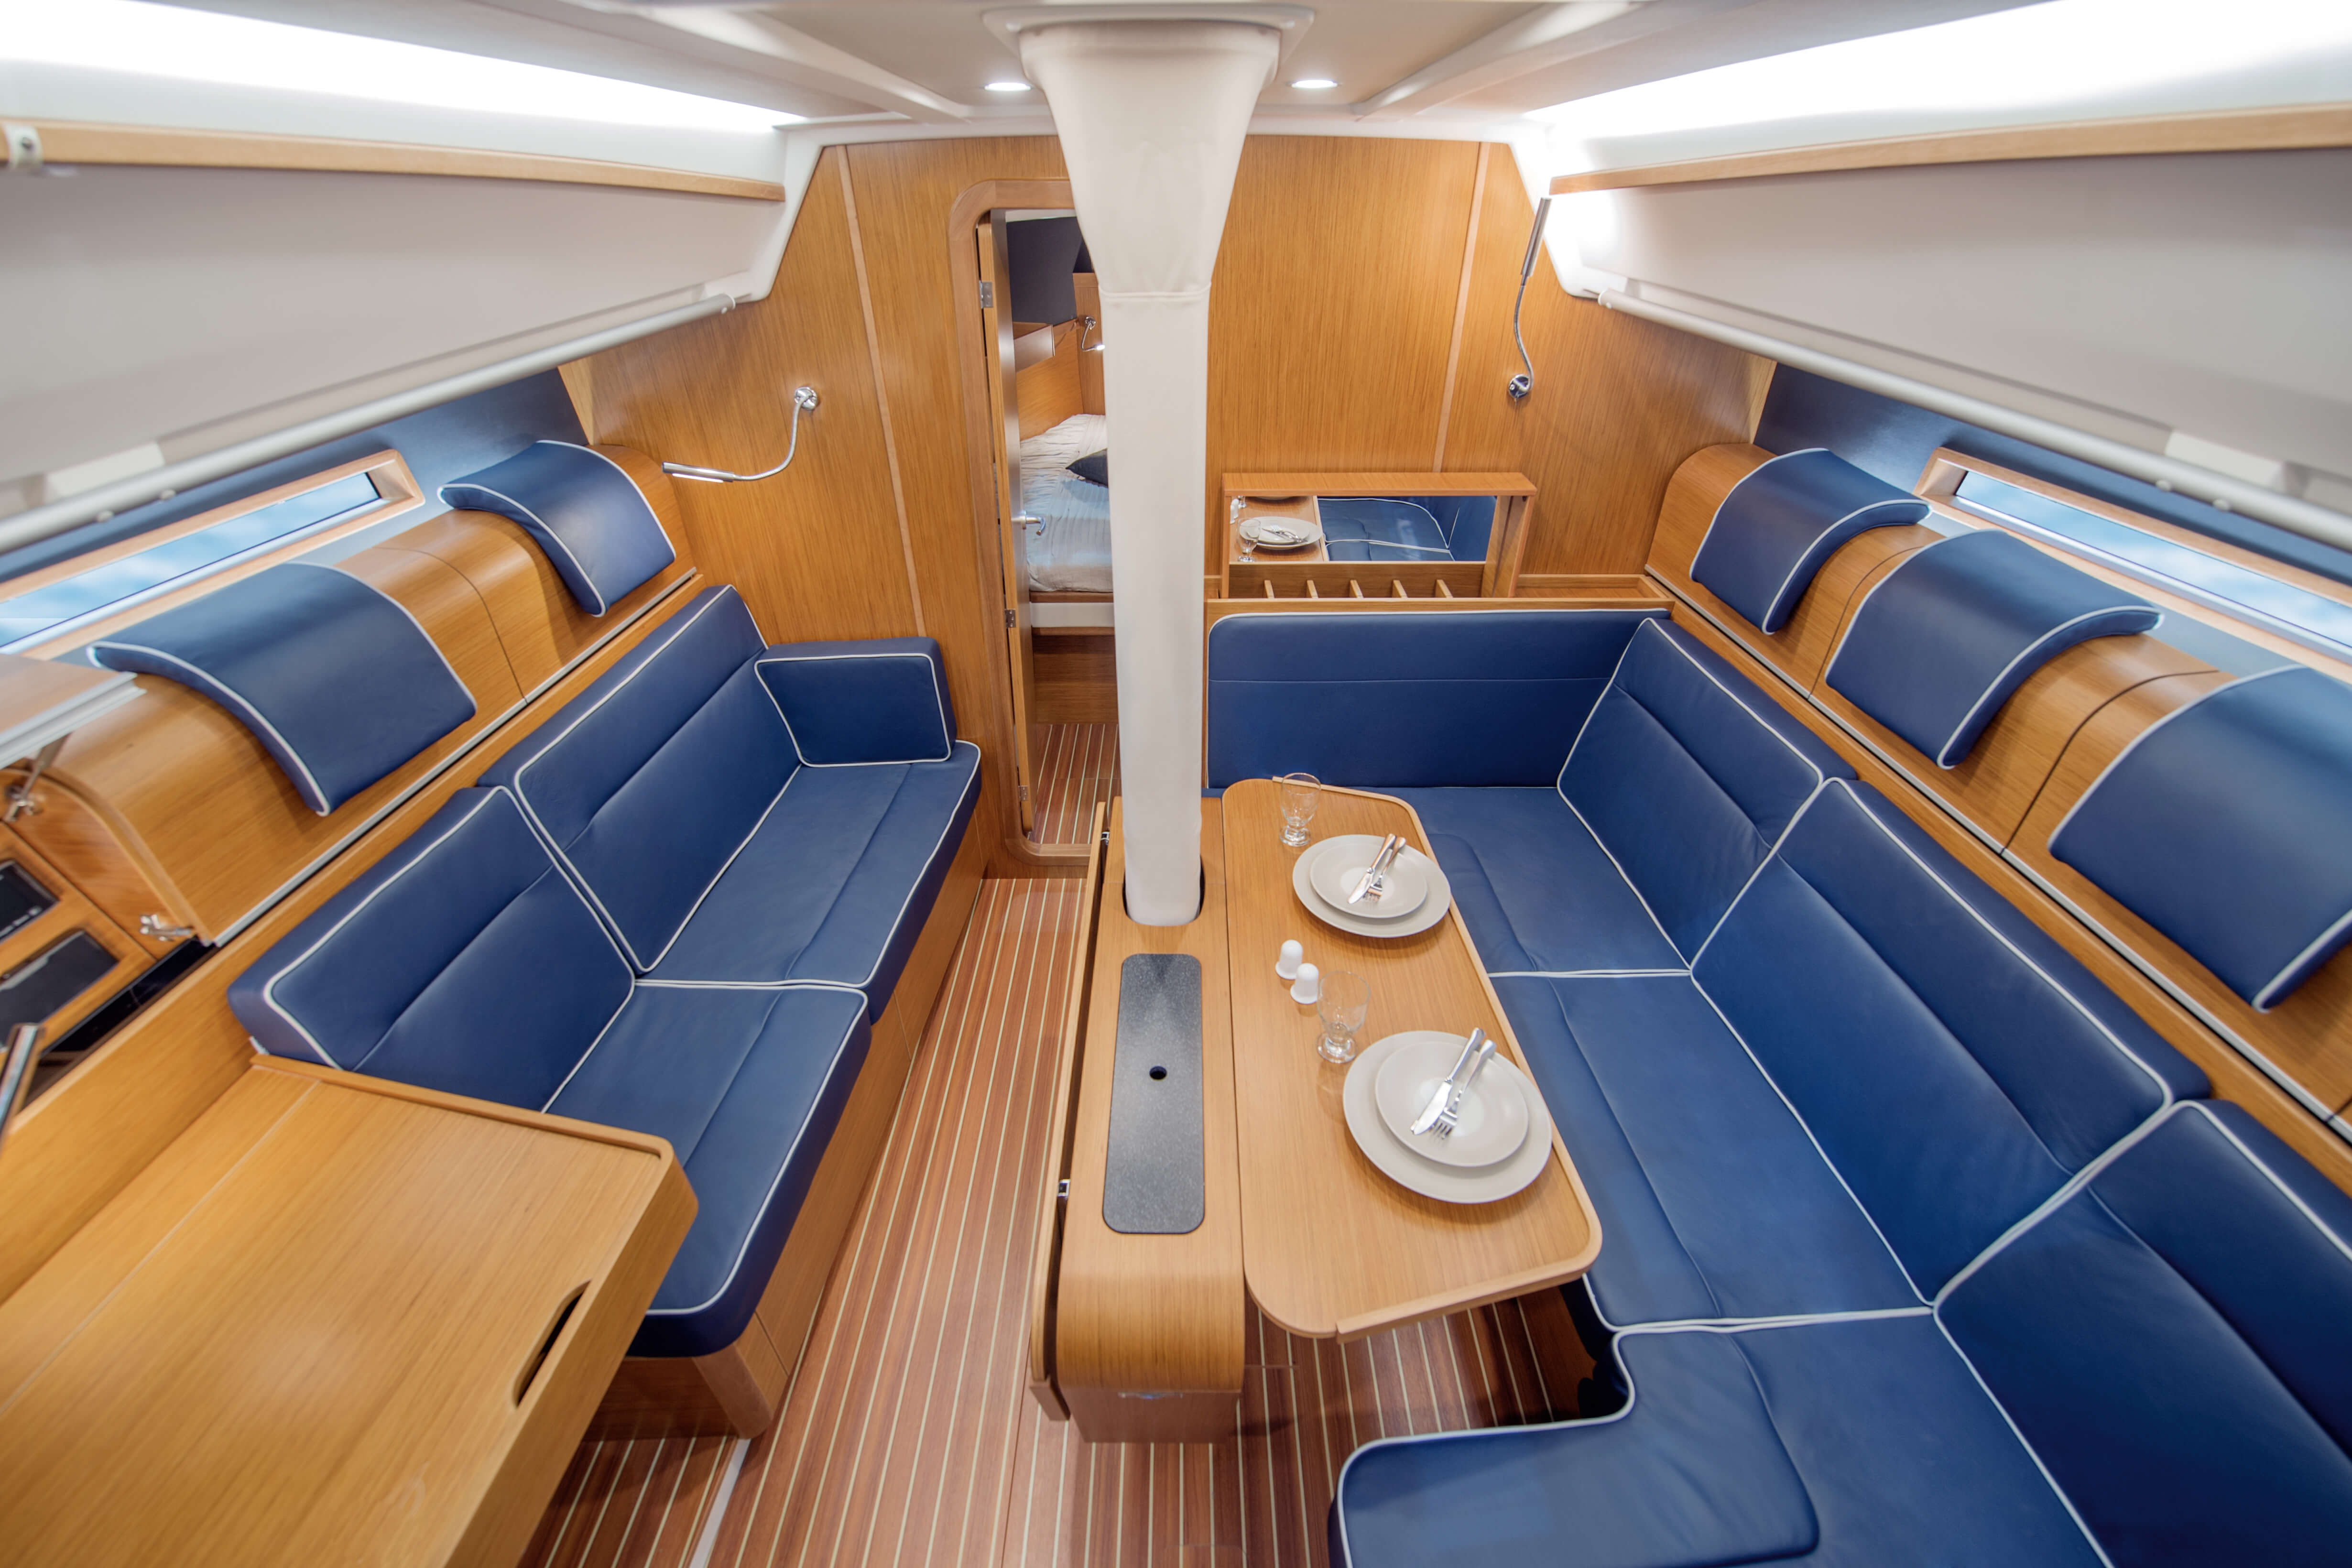 Dehler 42 Interior view lounge | B1 Layout: teak, sitting area, foldable table, window, deck hatch, bottle holder | Dehler